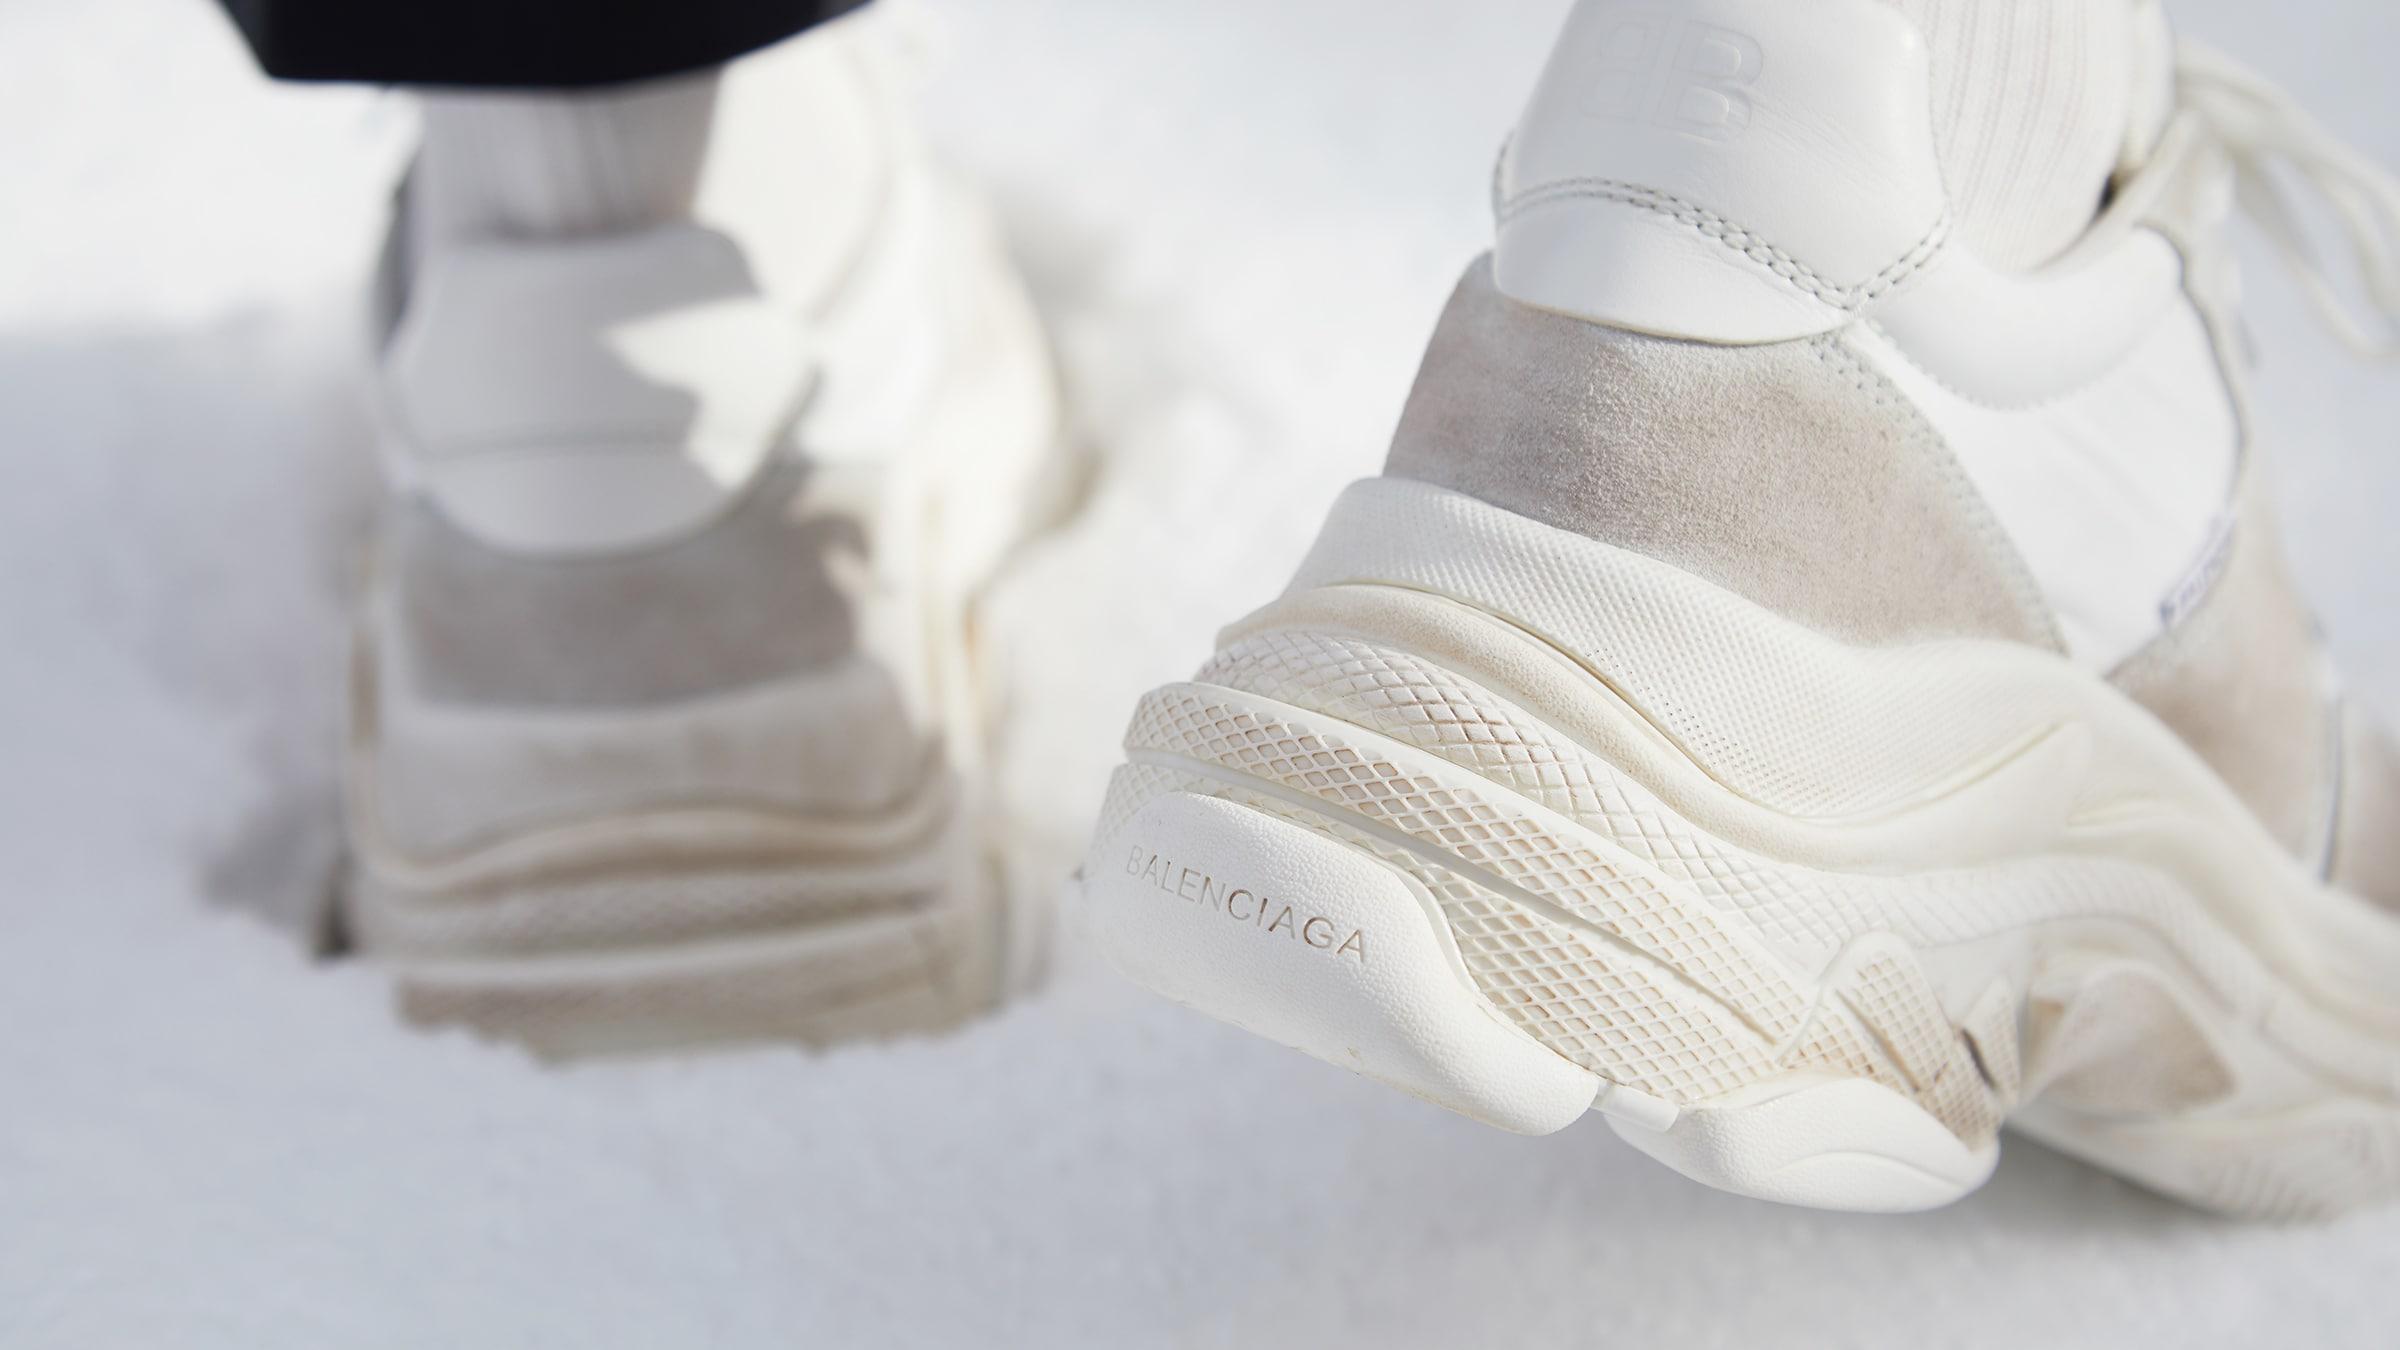 Balenciaga Triple S Clear Sole Trainers Cream White Review